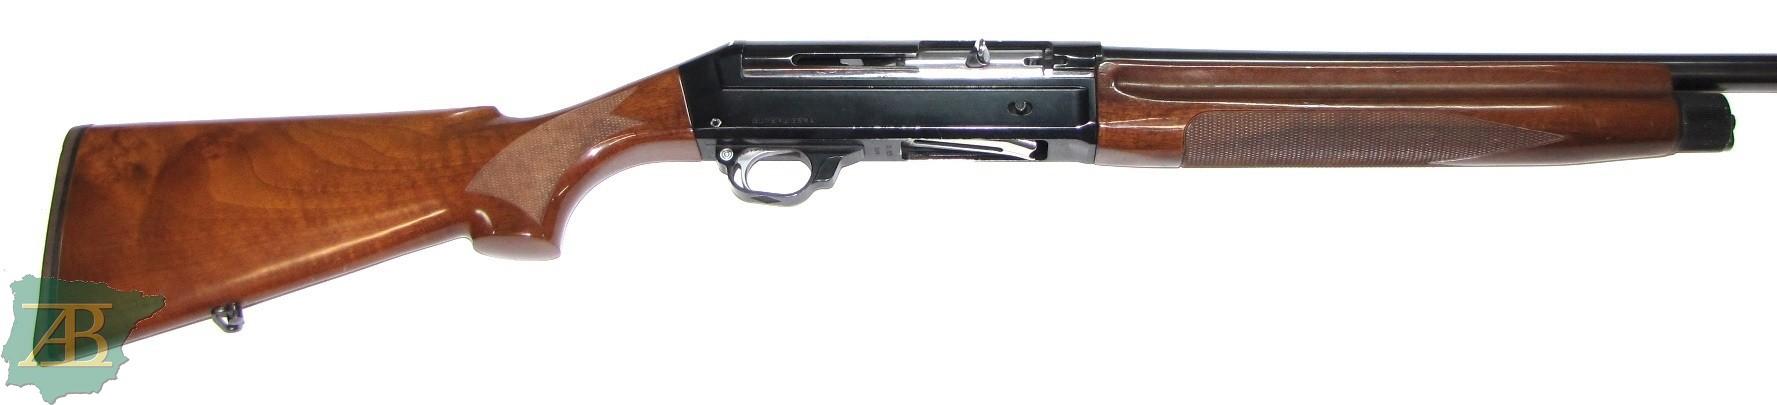 Escopeta semiautomática de caza BENELLI SL 125 Ref 5925-armeriaiberica-2